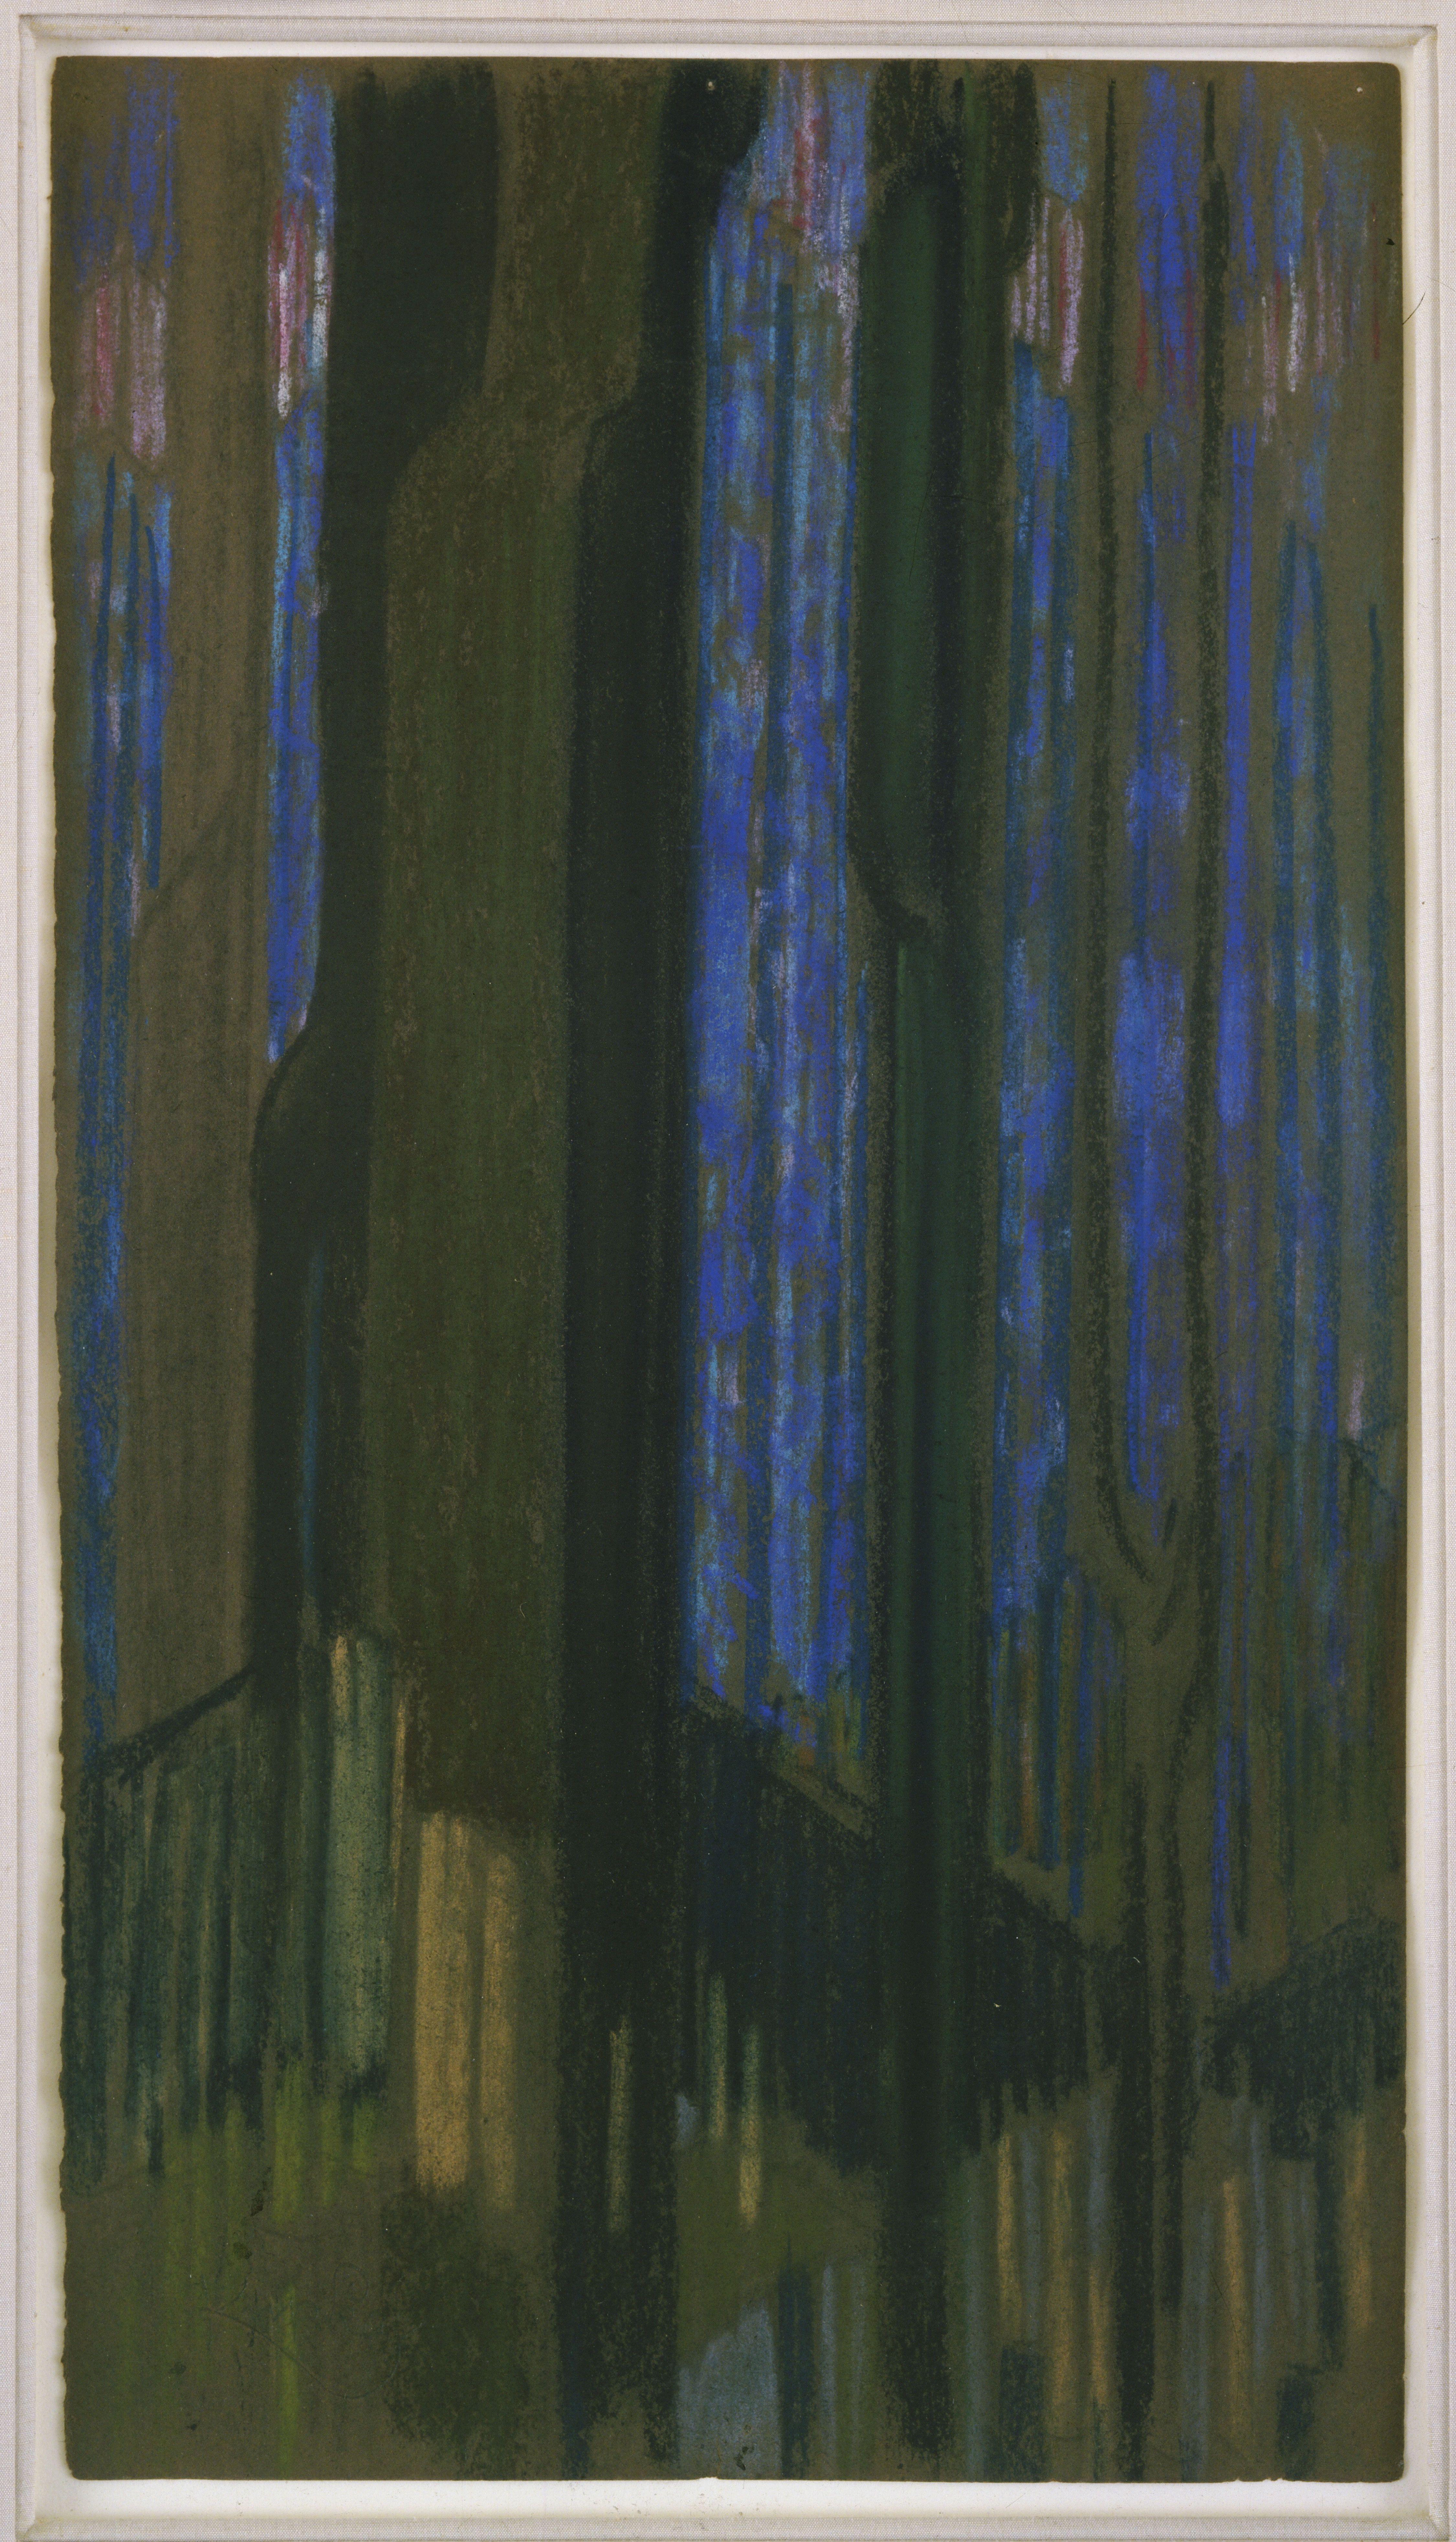 peinture: Franticek Kupka